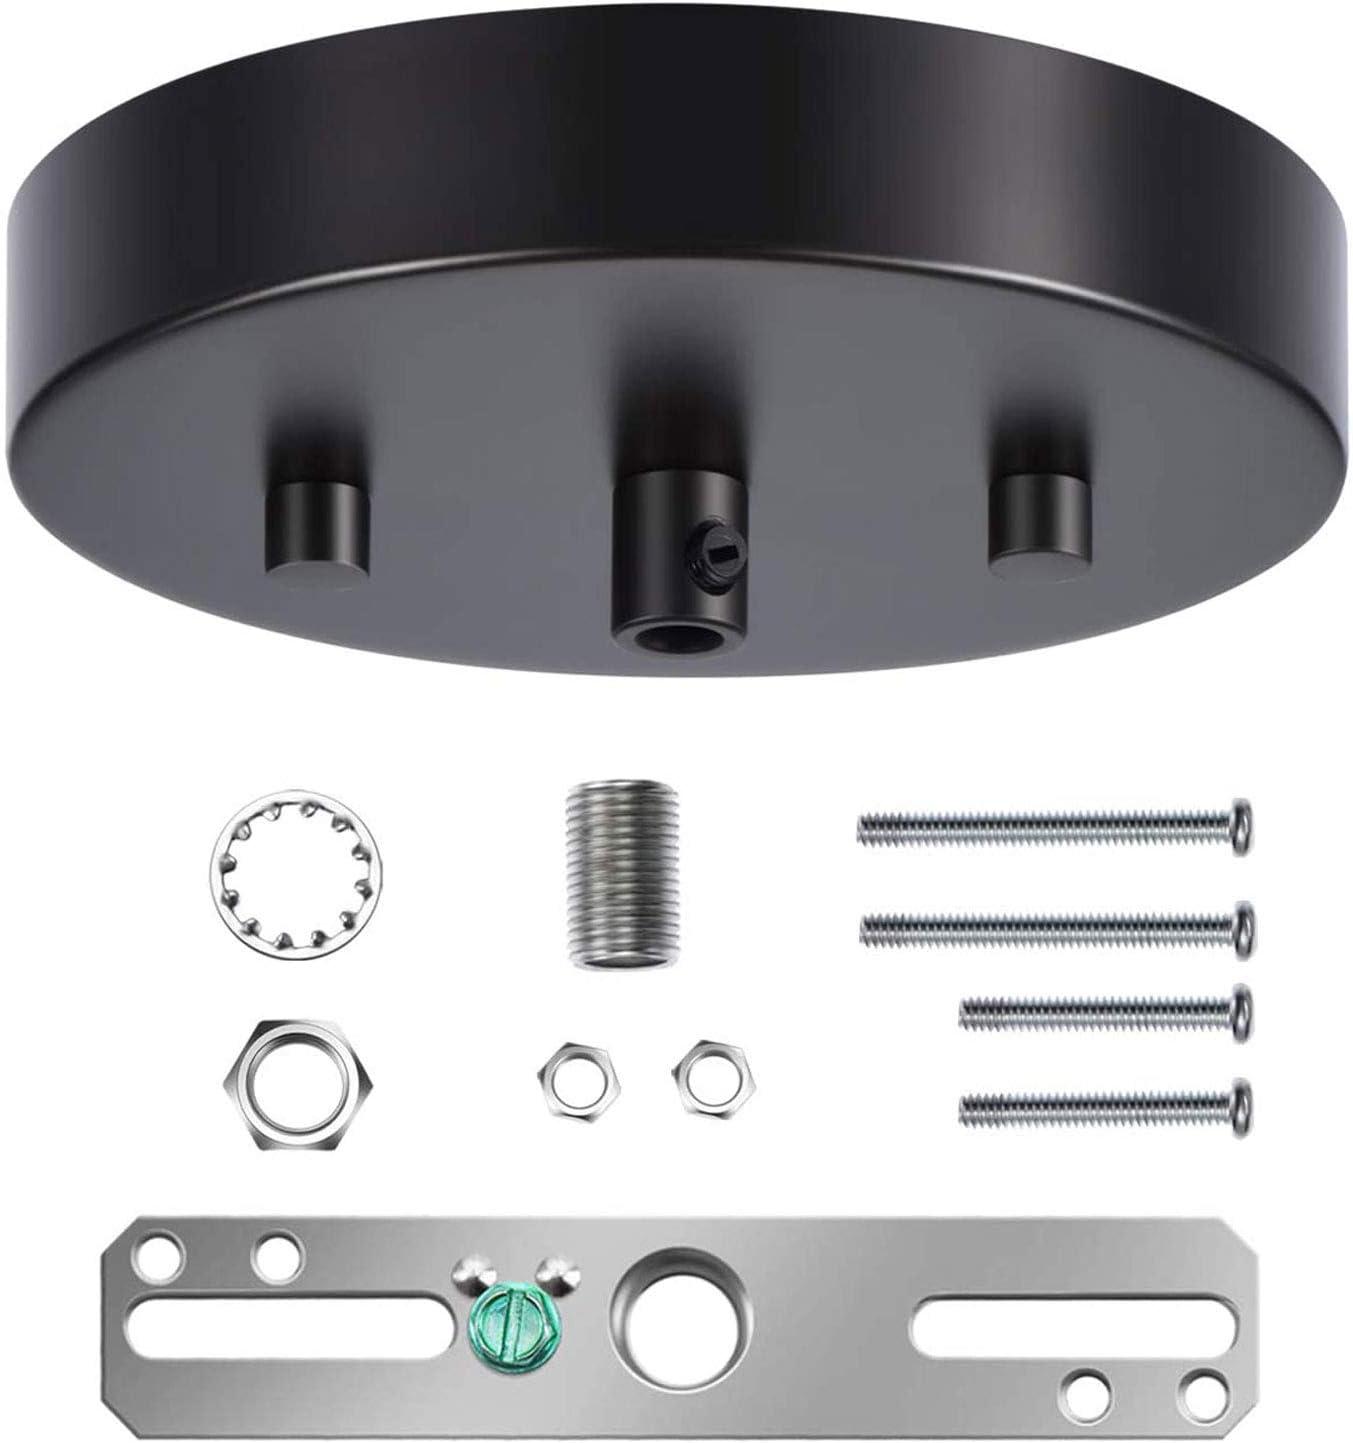 Lamp Loft Retro 9-Port Ceiling Canopy Kit Color Cord Swag DIY Industrial Pendant